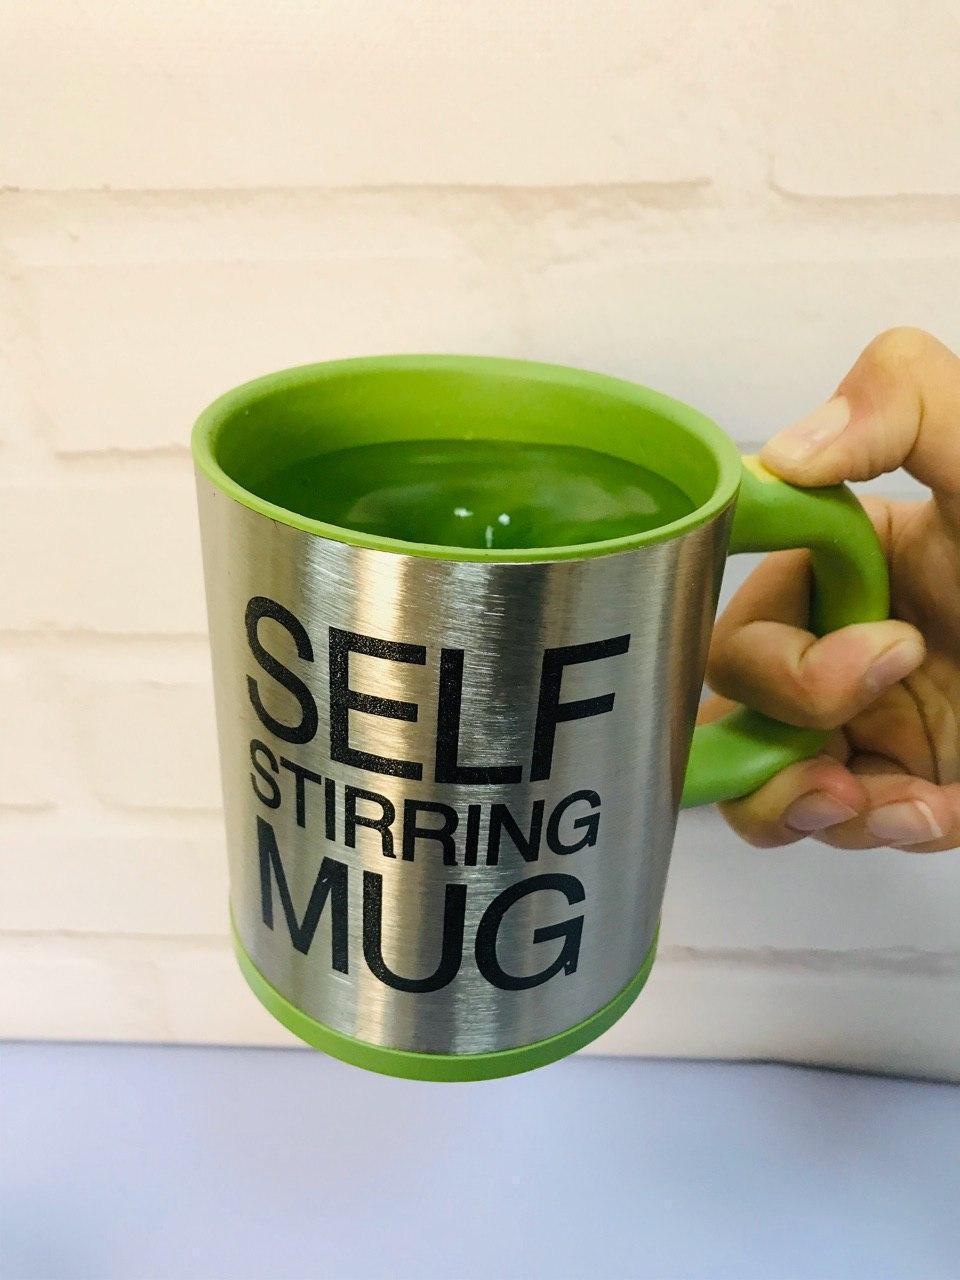 Cаморазмешивающая Термокружка  с вентилятором UFT Self Stirring Mug